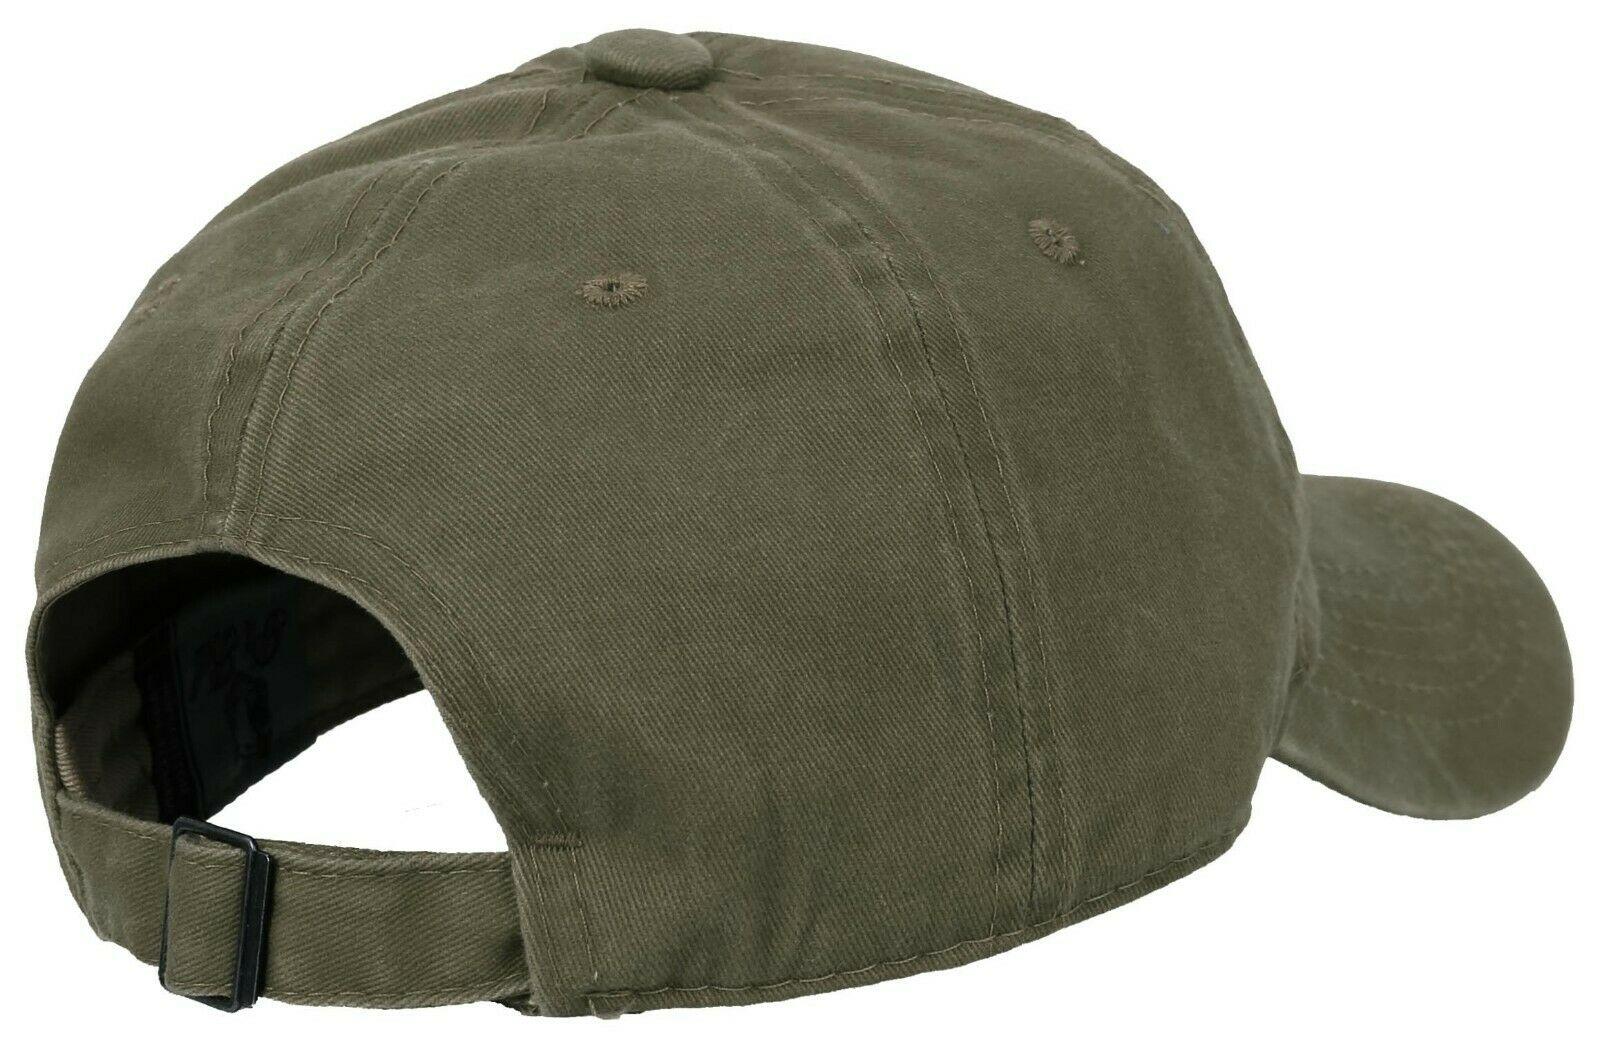 BASEBALL-CAP-Plain-Dad-Hat-Low-Profile-Vintage-Washed-Pigment-Adjustable thumbnail 9